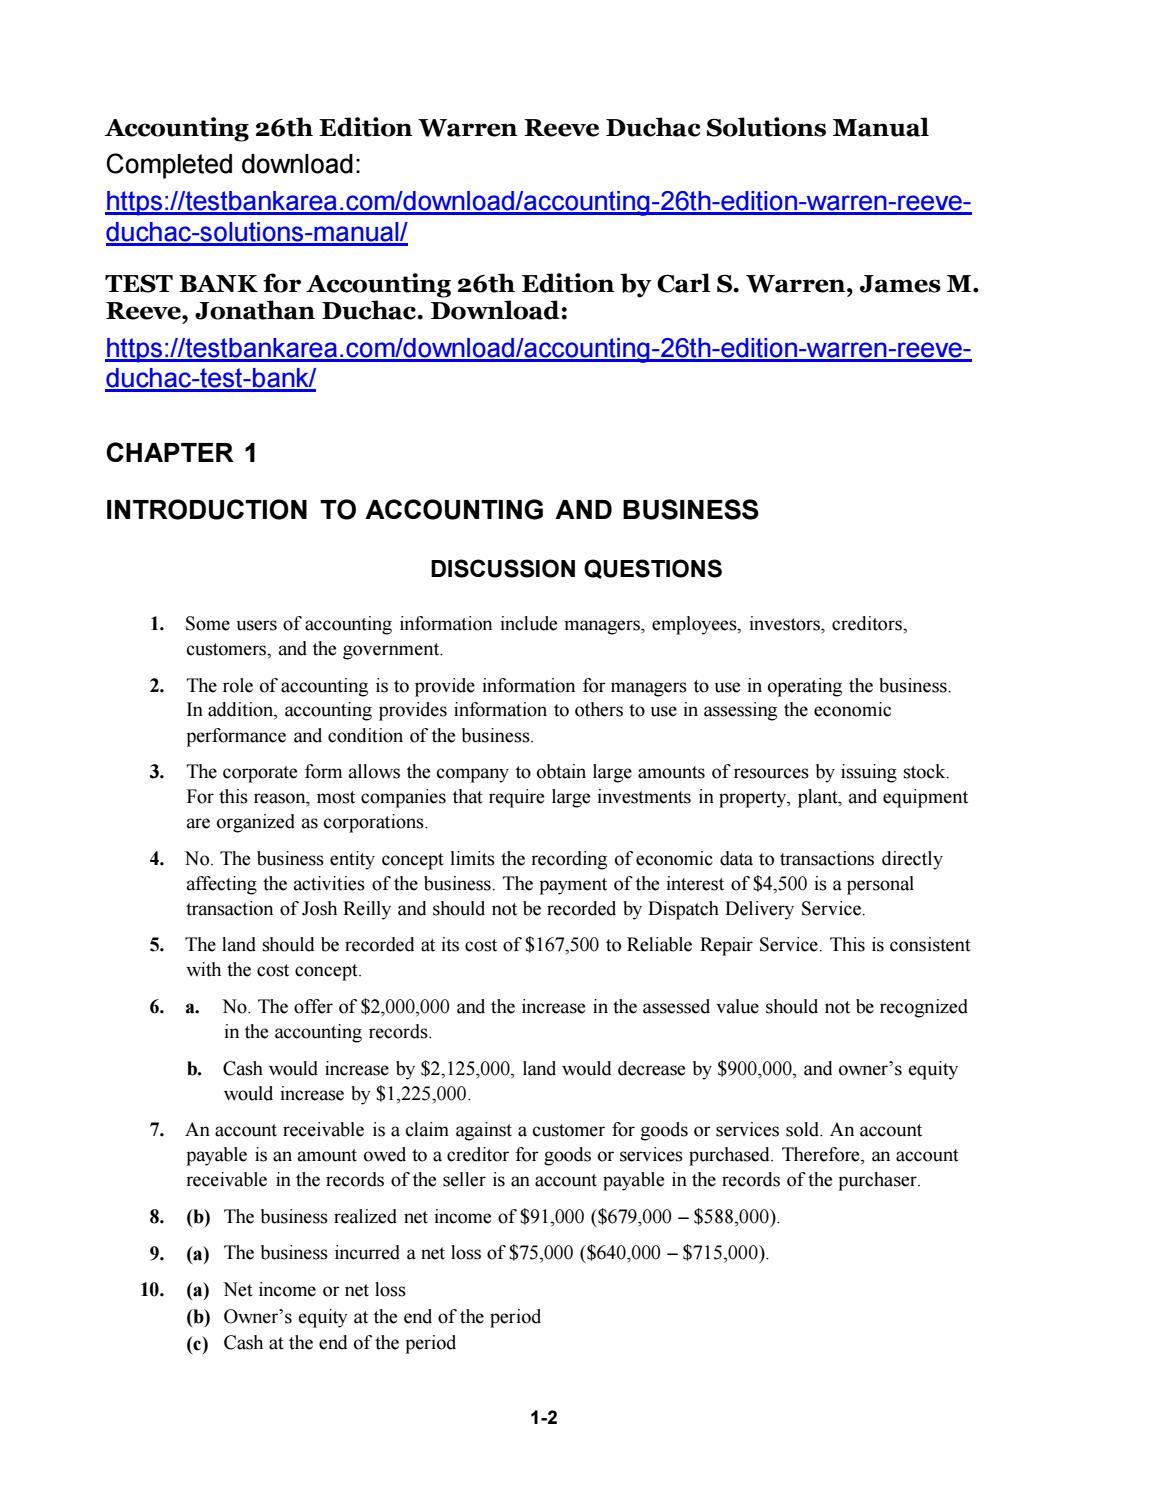 Accounting 26th edition warren reeve duchac solutions manual by Brigham223  - issuu